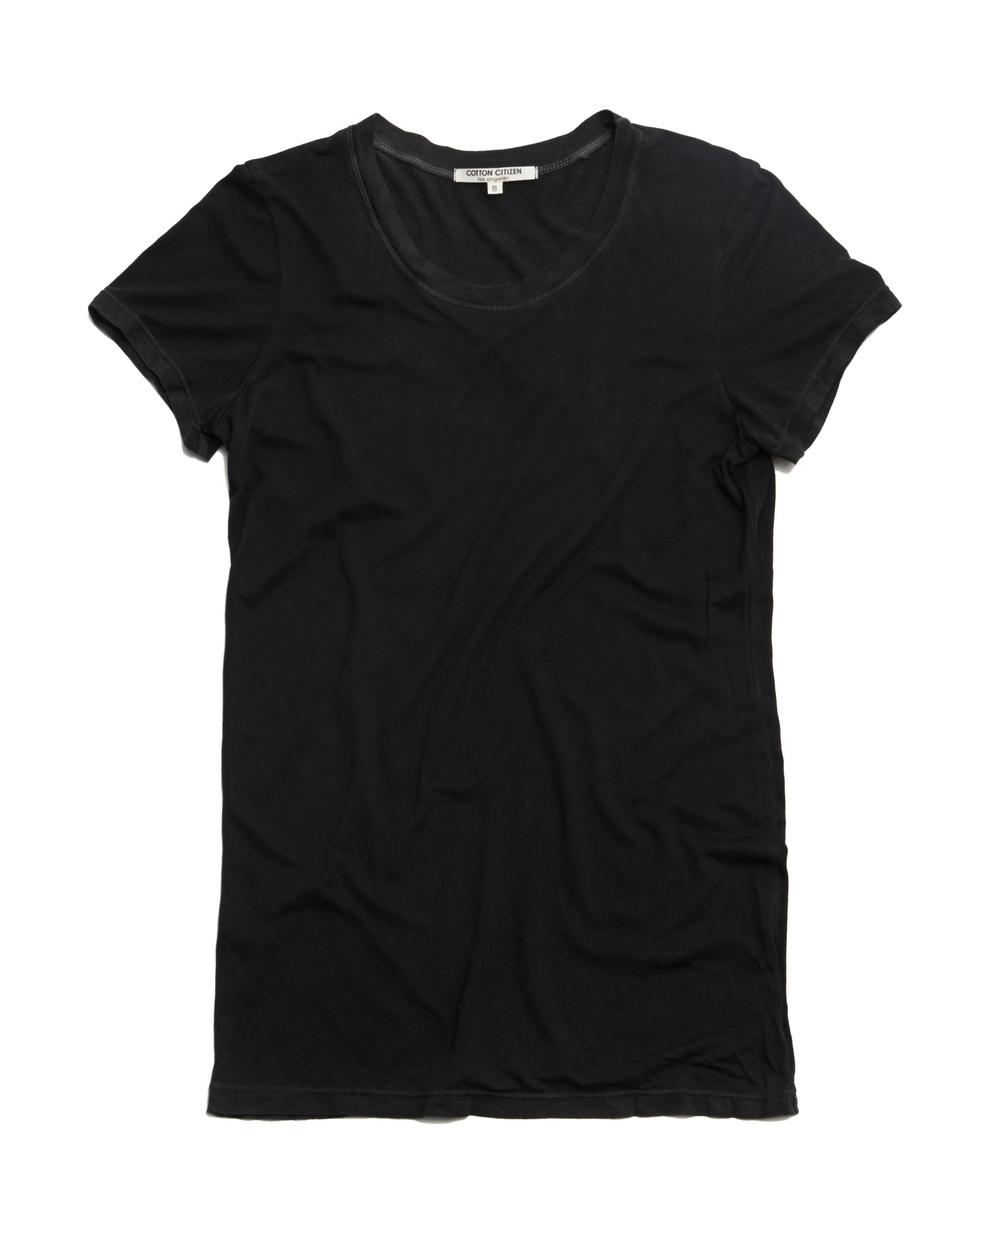 Cotton Citizen Crew Neck Tee T-Shirt for Women